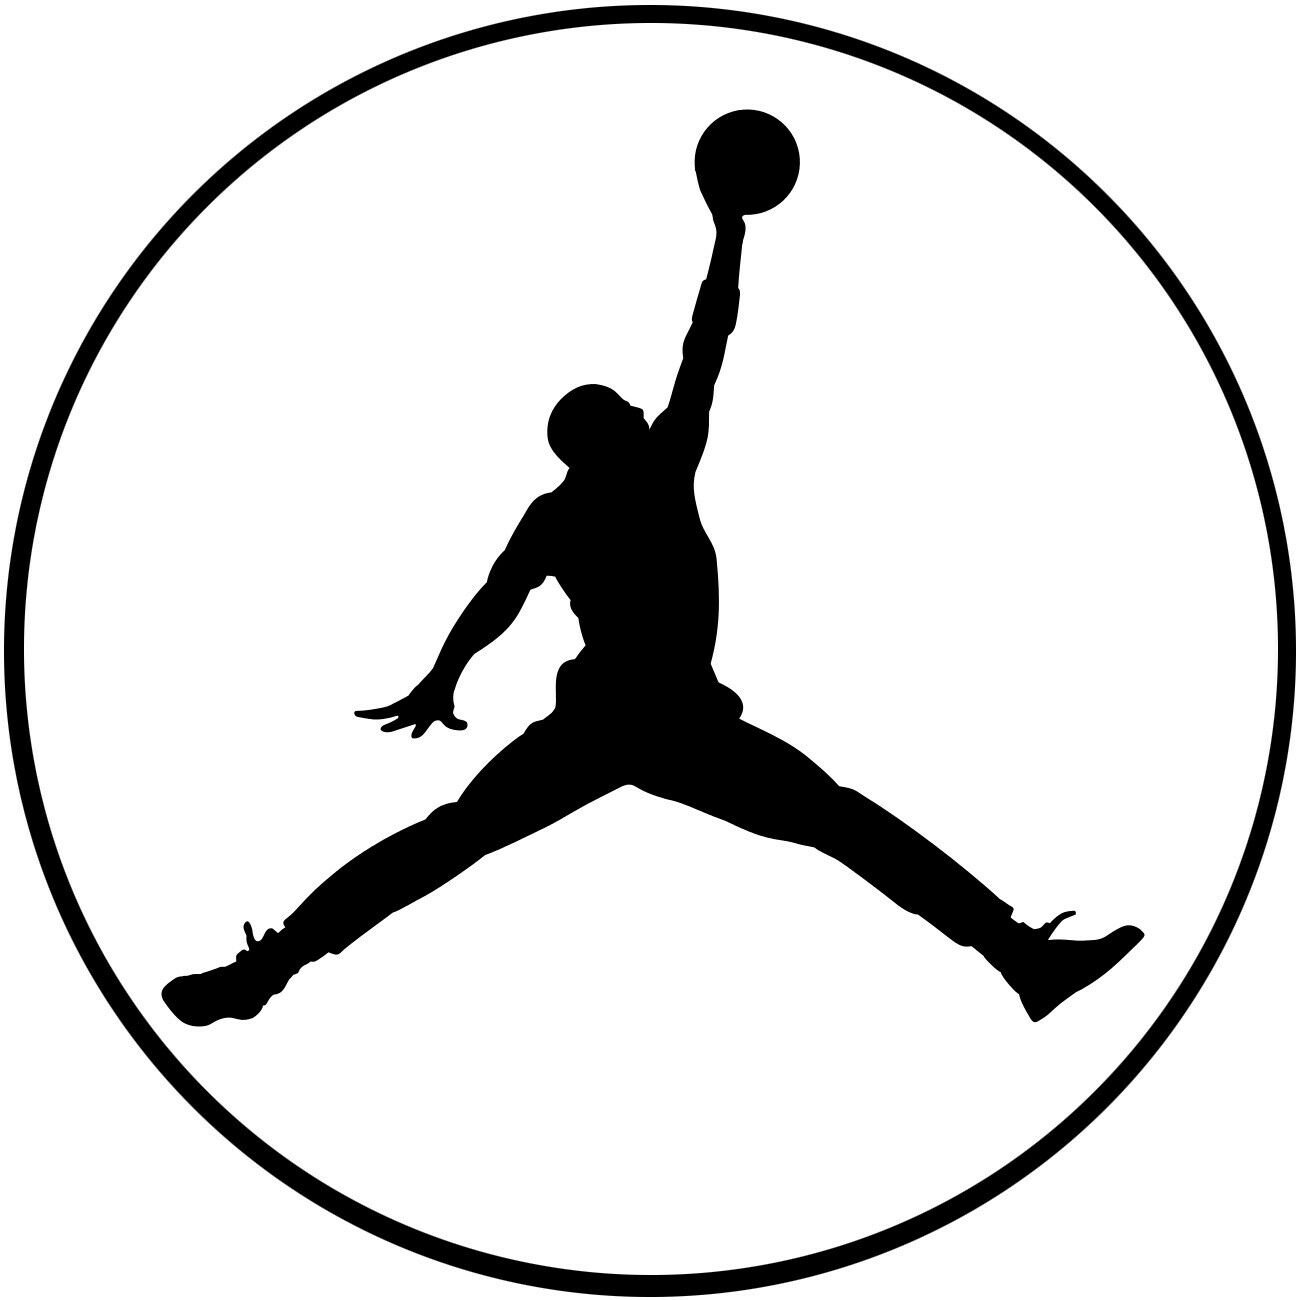 Michael Jordan Design #2 Vinyl Decal Sticker Basketball MJ NBA Jumpman Car Window Wall Air